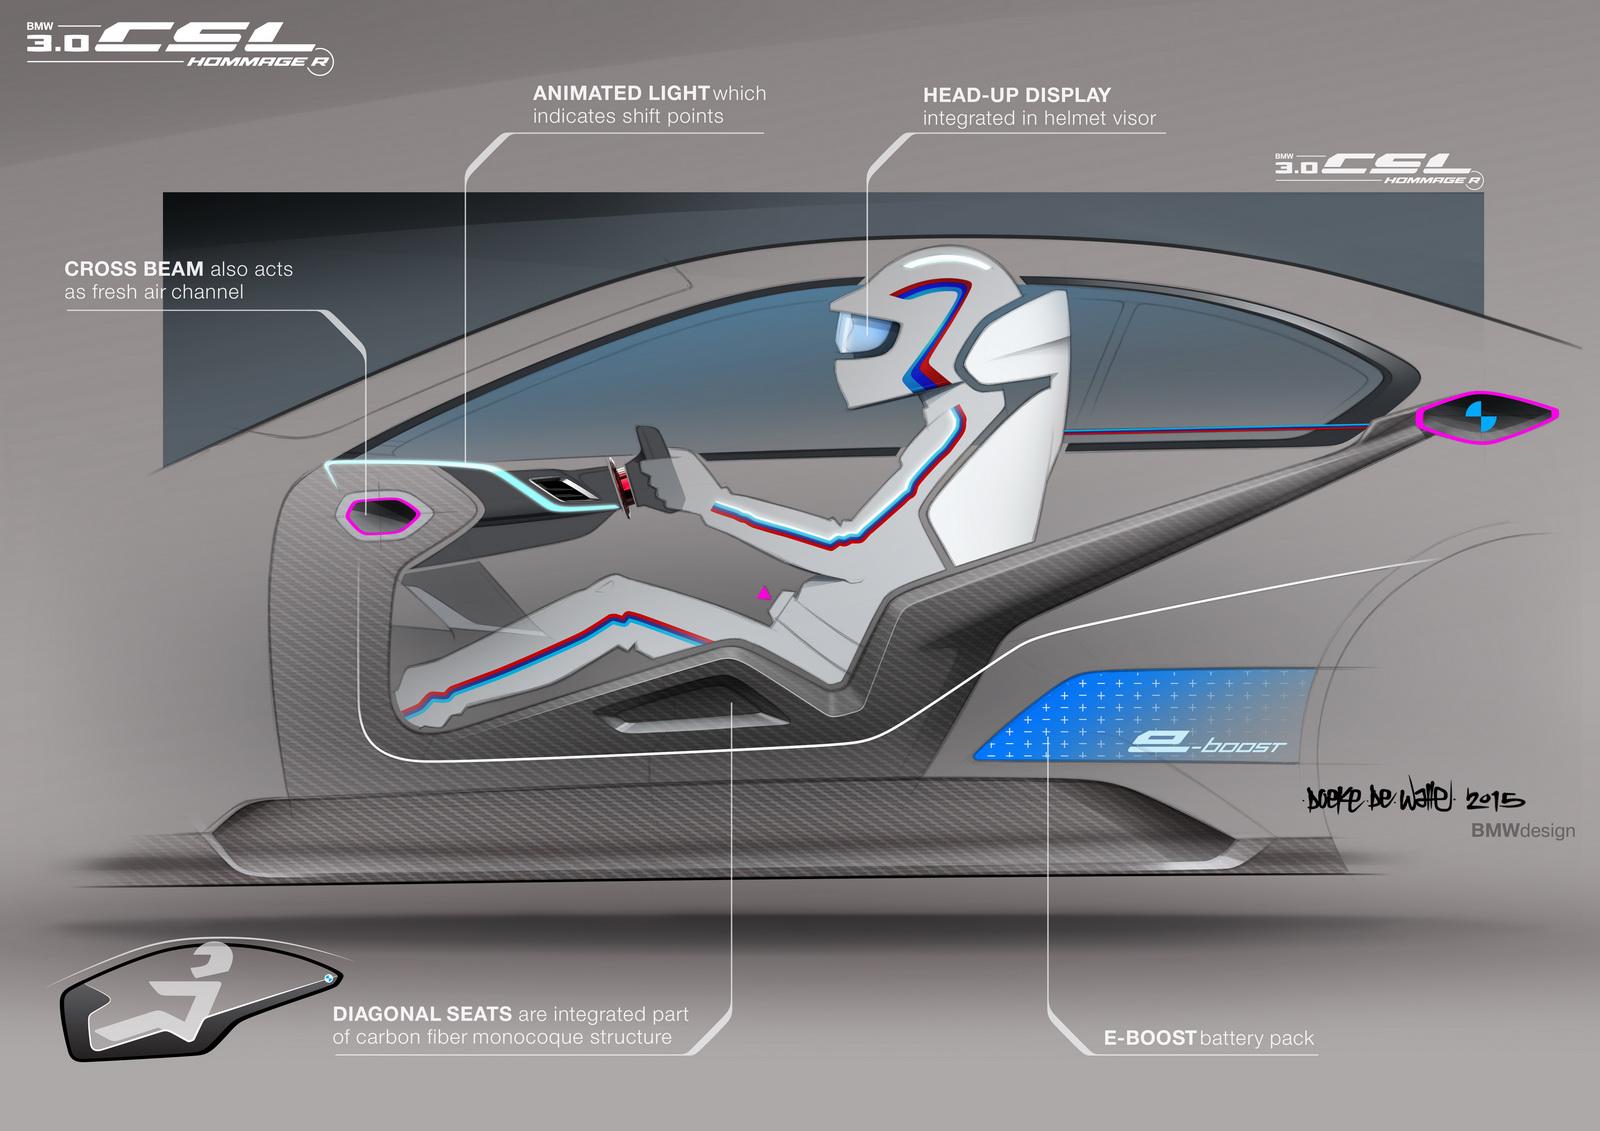 BMW-30-Hommage-R-Concept-42